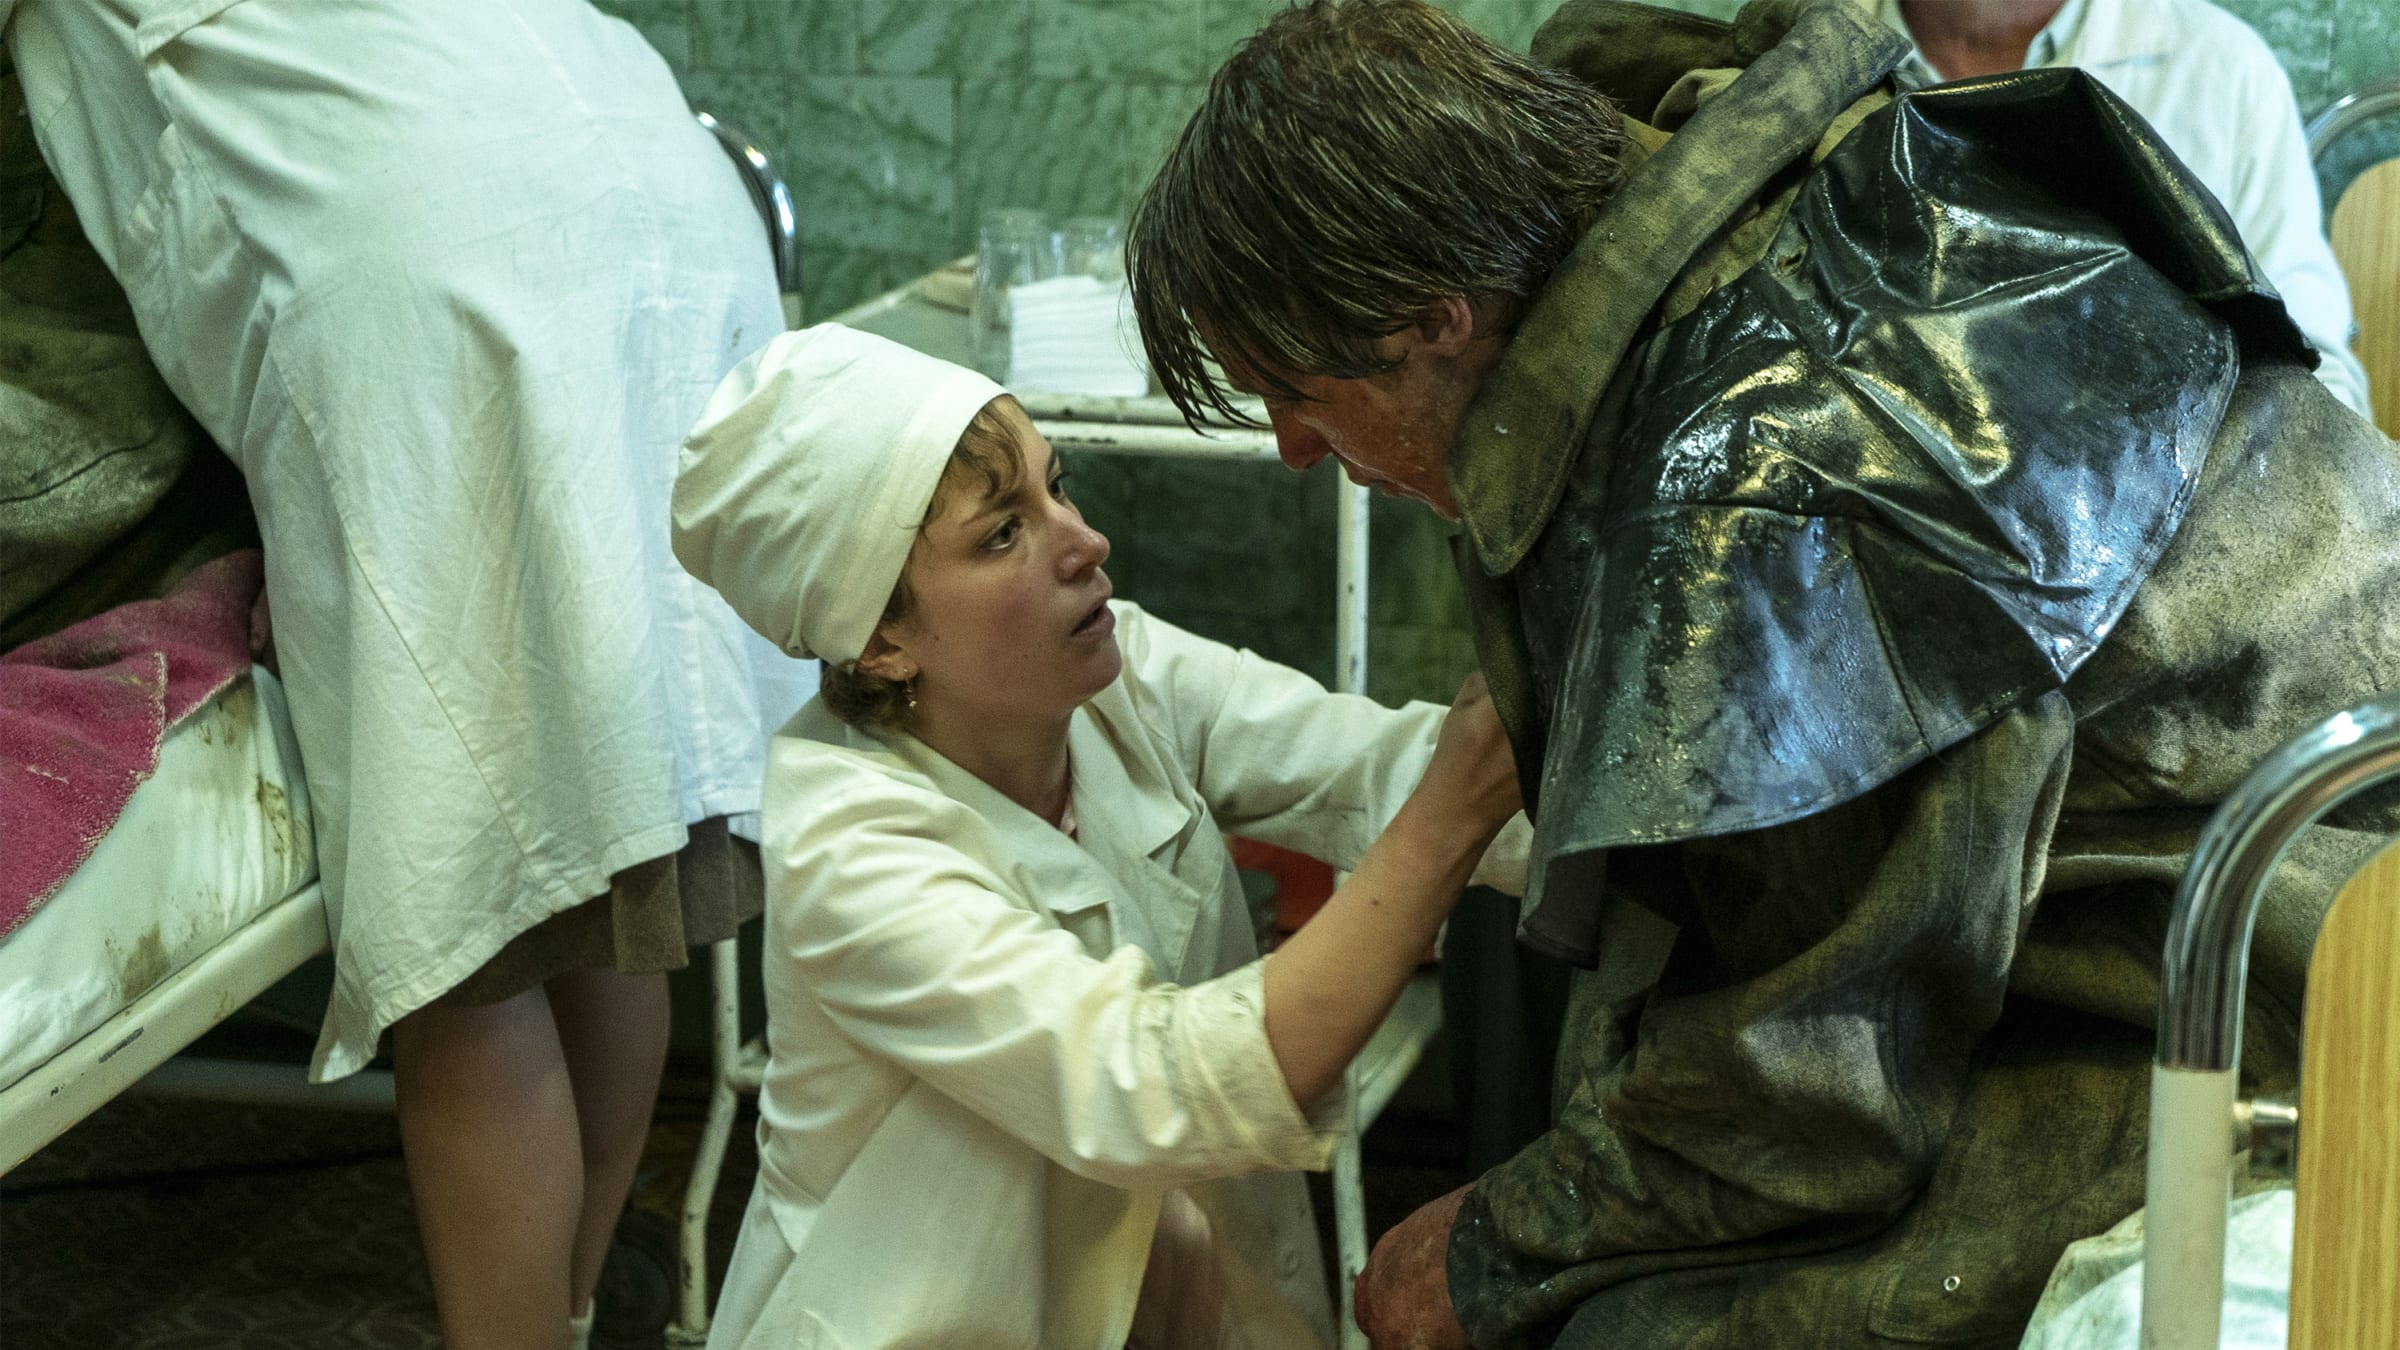 Chernobyl Survivors Watch HBO Series in Horror